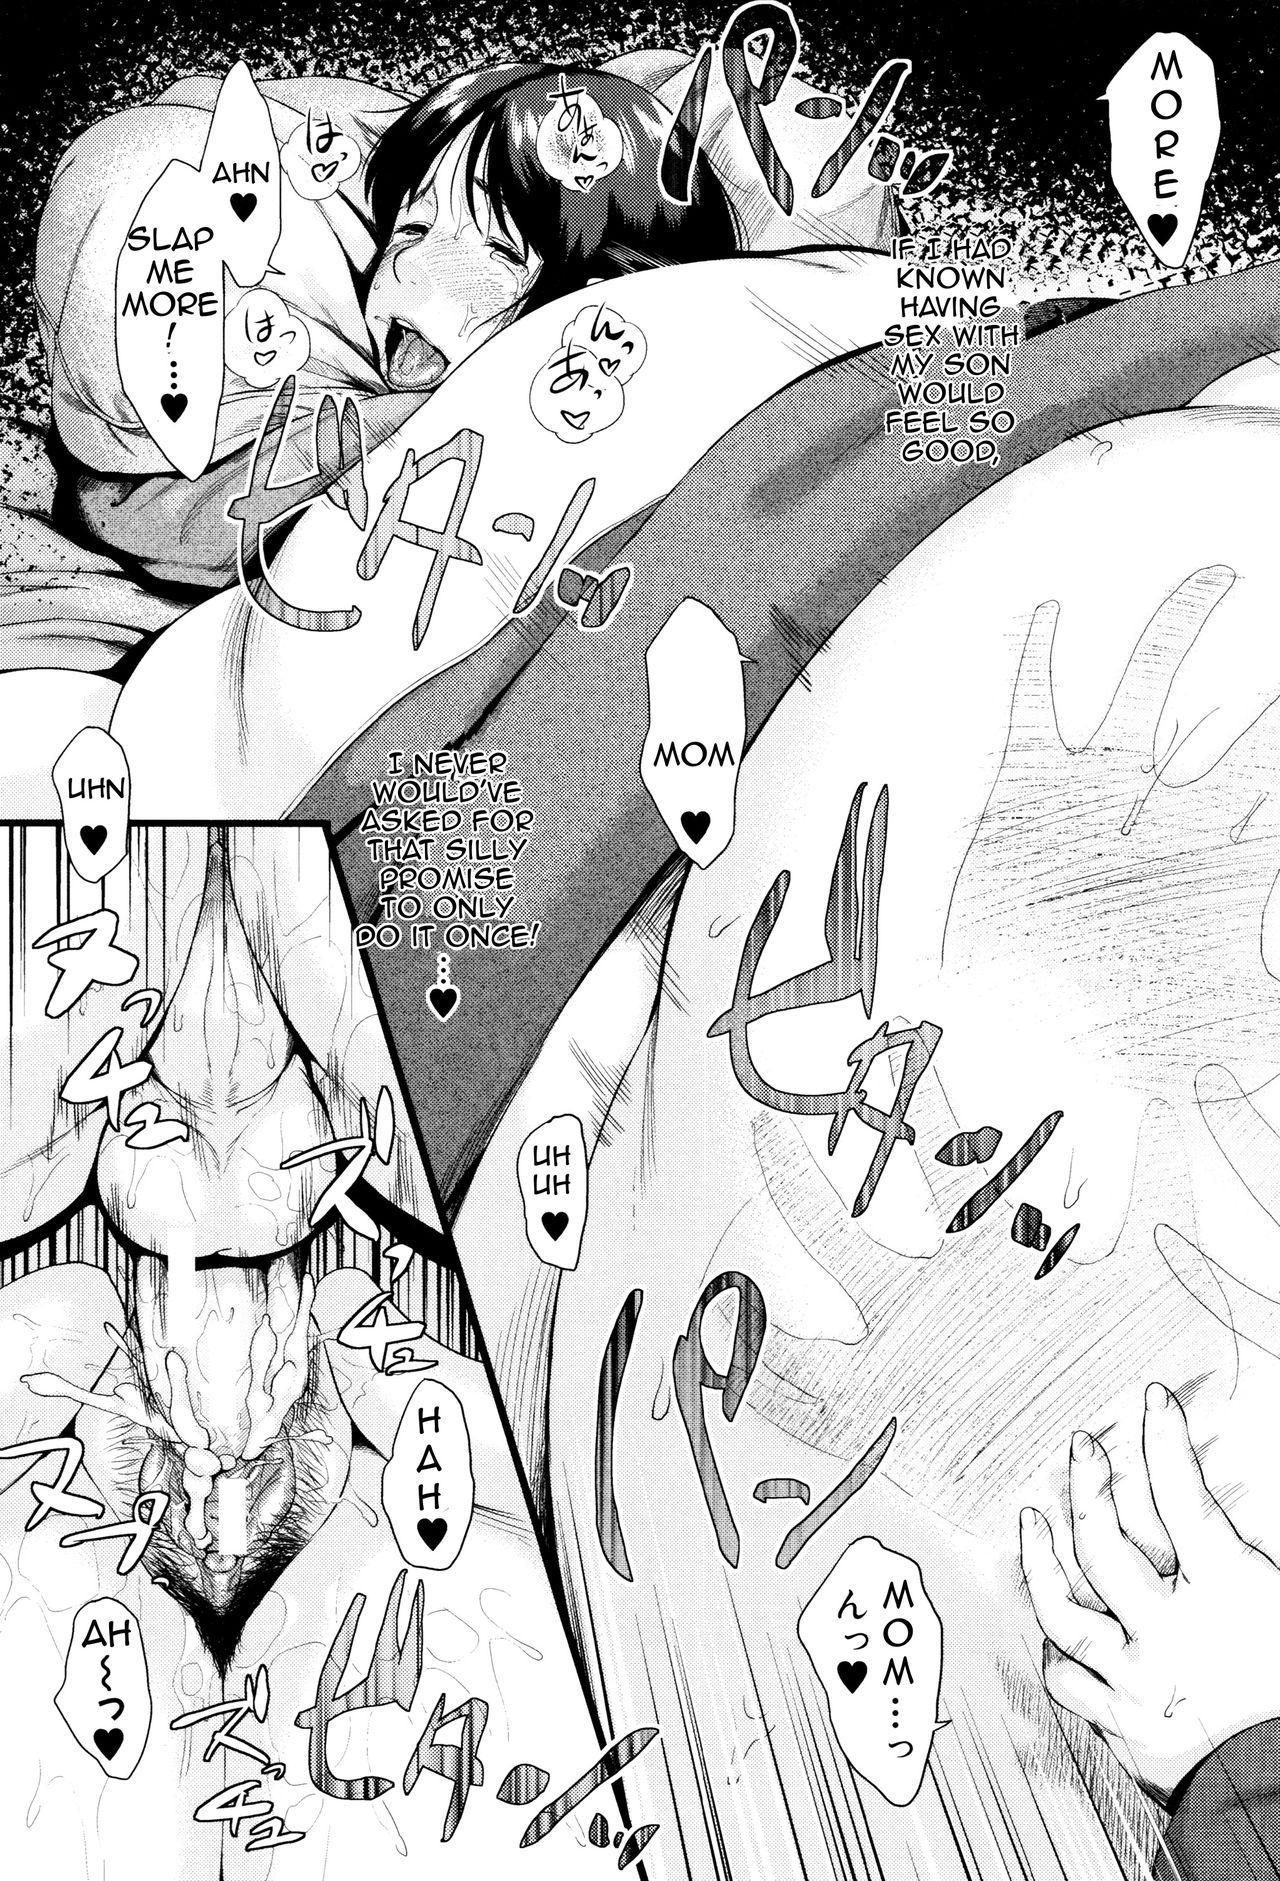 [Jitsuma] Kinyoubi no Haha-tachi e - To Friday's mothers [English] [Amoskandy, desudesu, Kusanyagi] 63